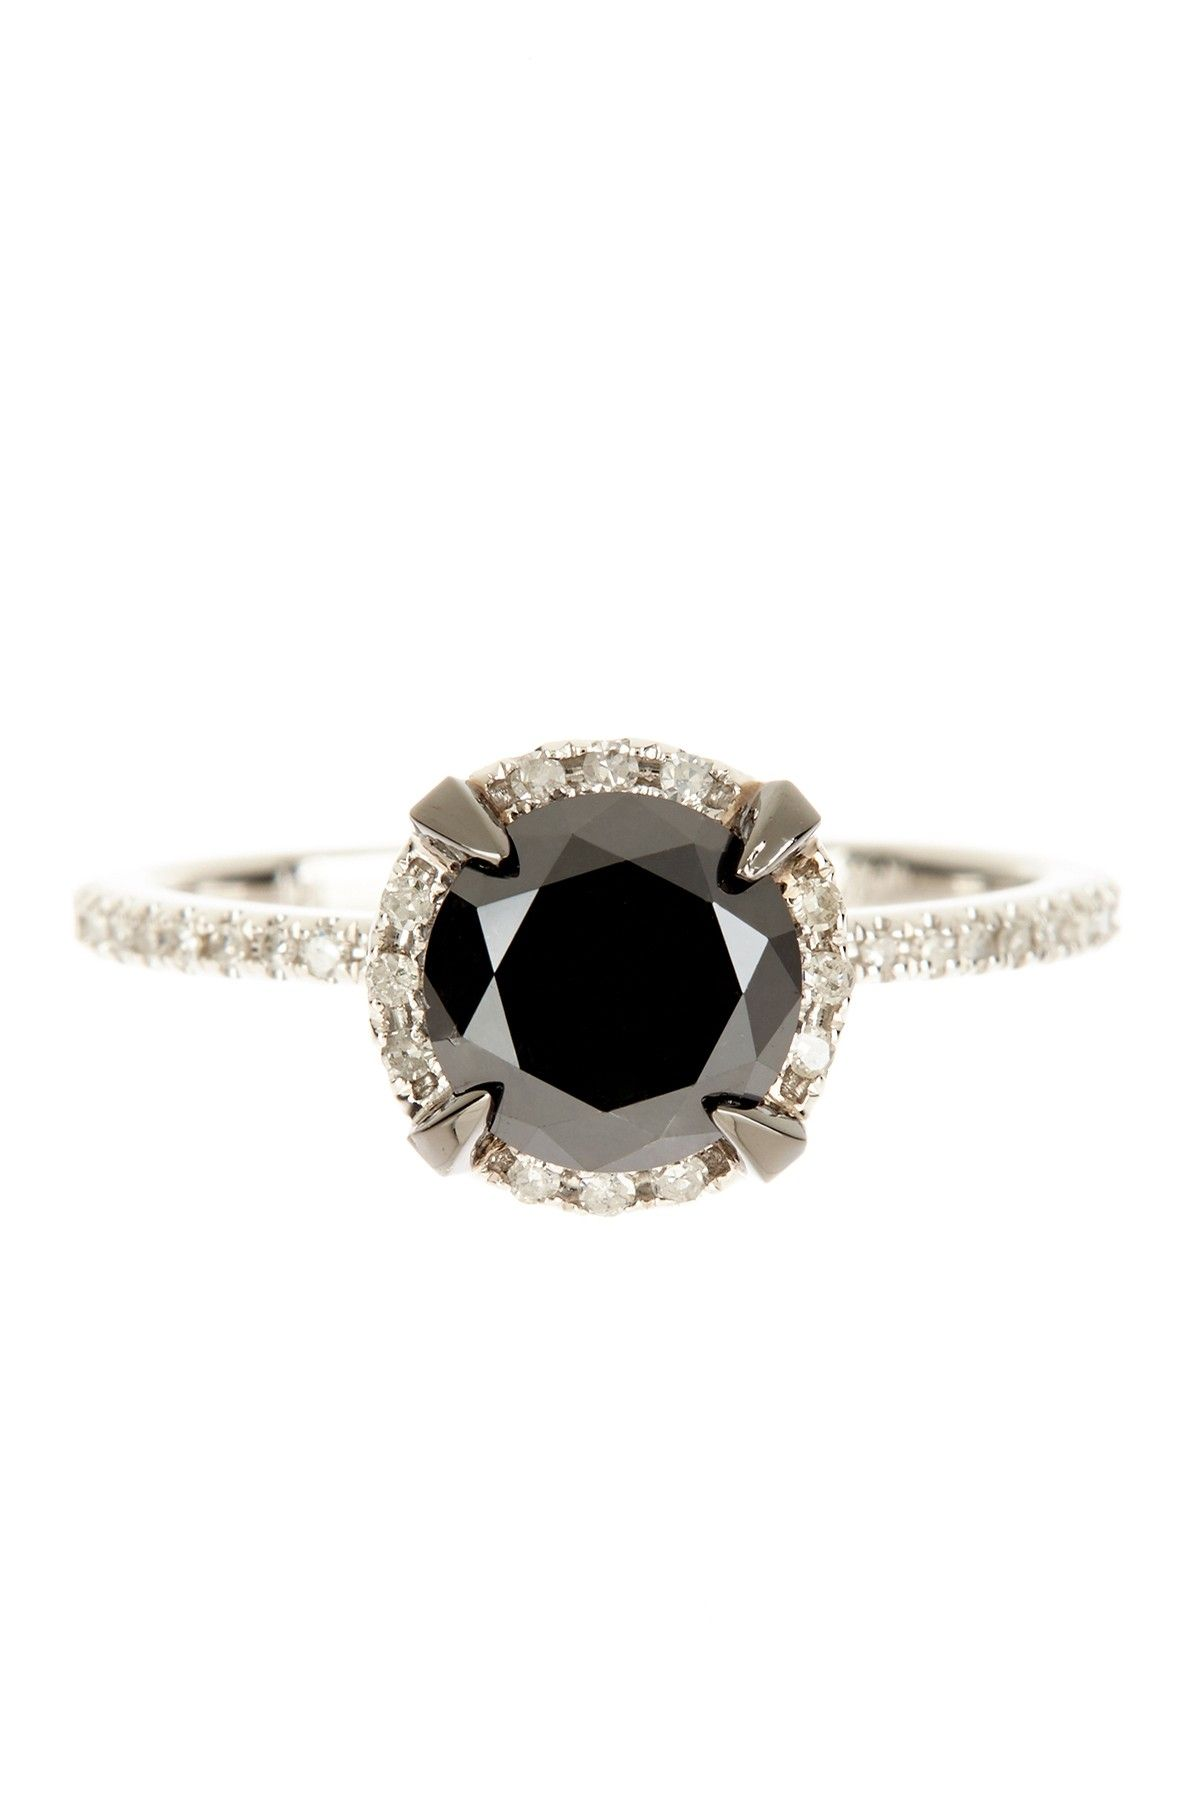 Halo Black Diamond Ring Wishful wedding attire